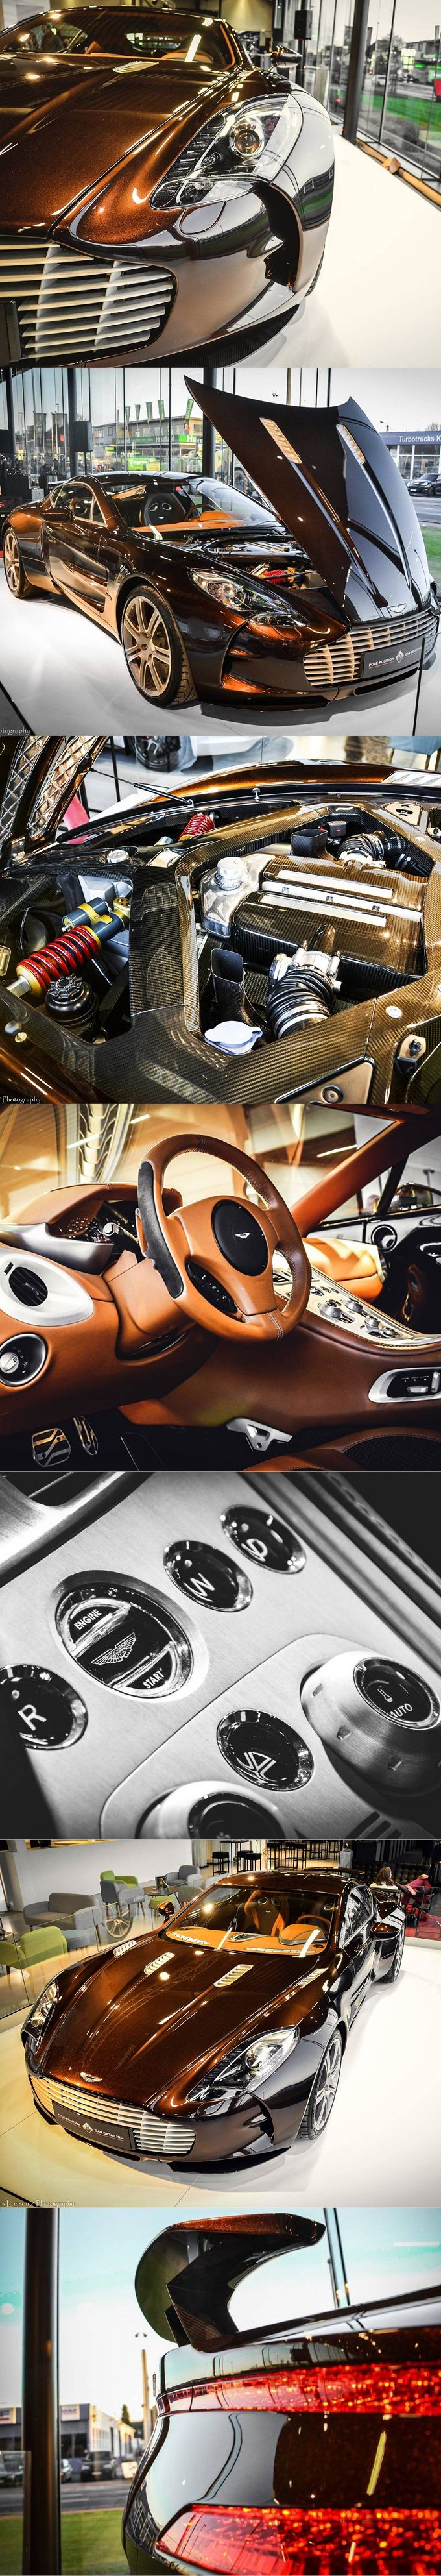 96 best Cars images on Pinterest